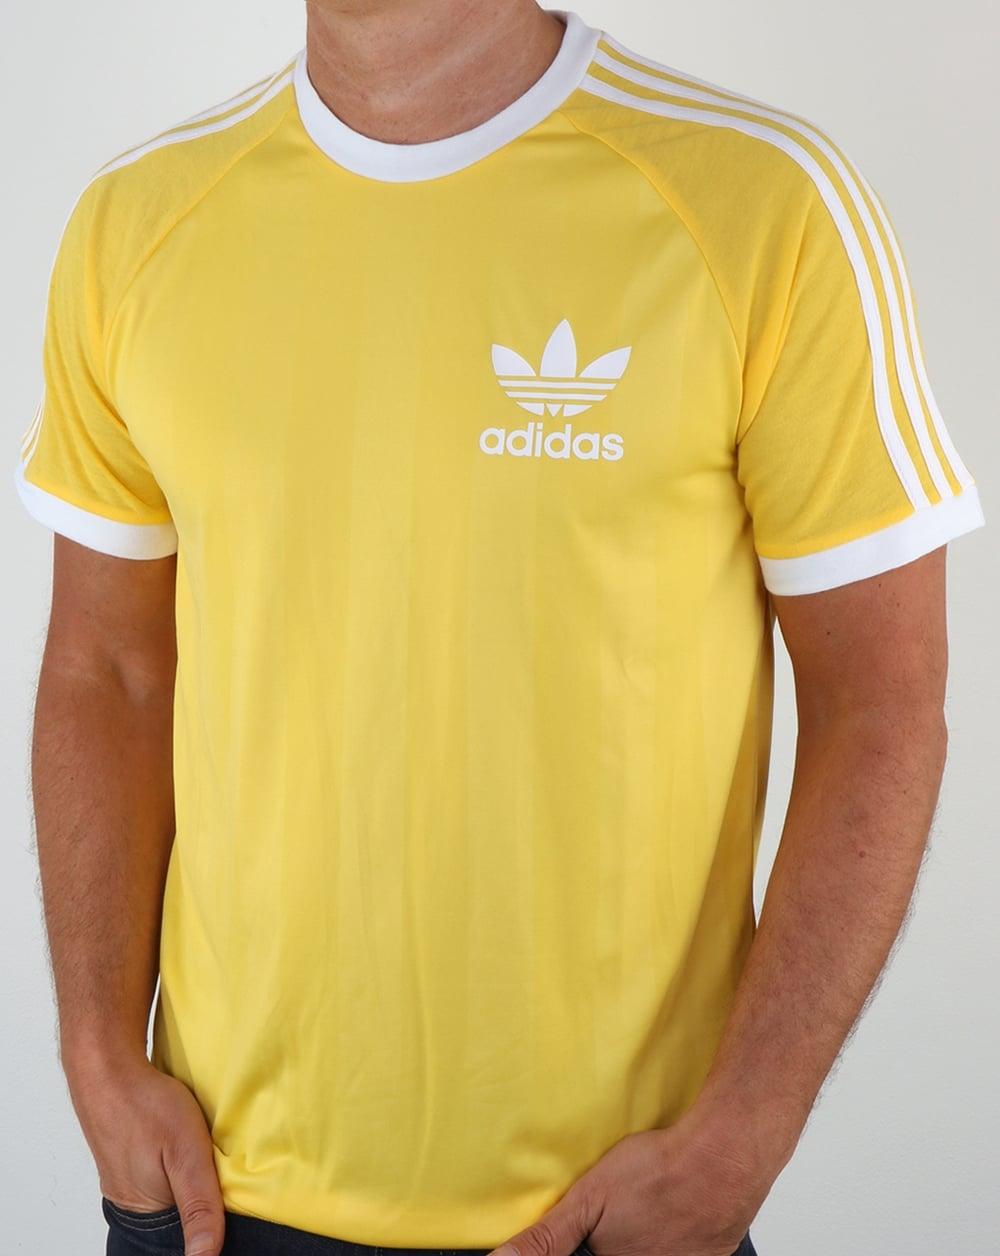 adidas originals old skool t shirt spring yellow football. Black Bedroom Furniture Sets. Home Design Ideas